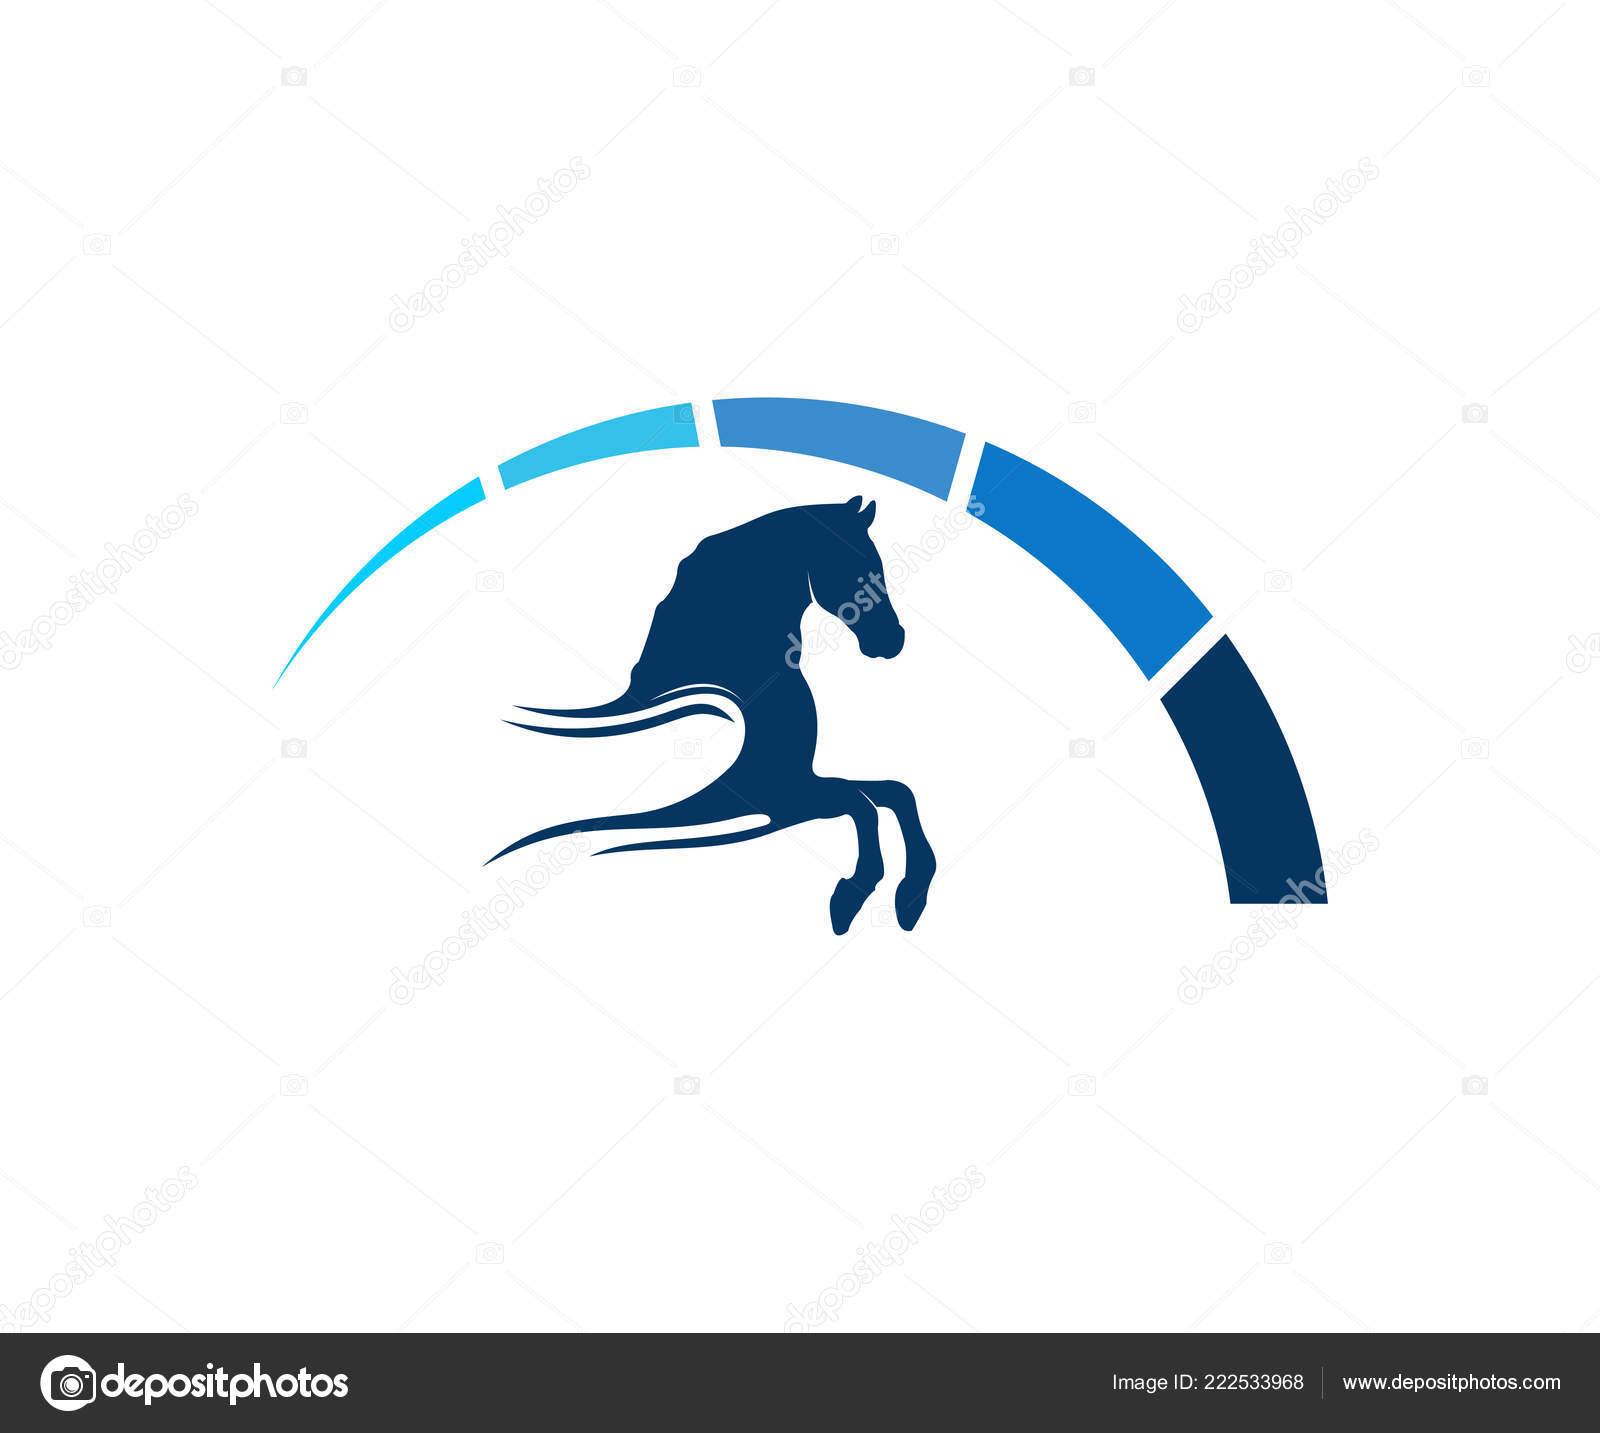 Horse Farm Logo Design Simple Horse Sport Vector Logo Design Inspiration Racing Equestrian Farm Stock Vector C Great19 222533968